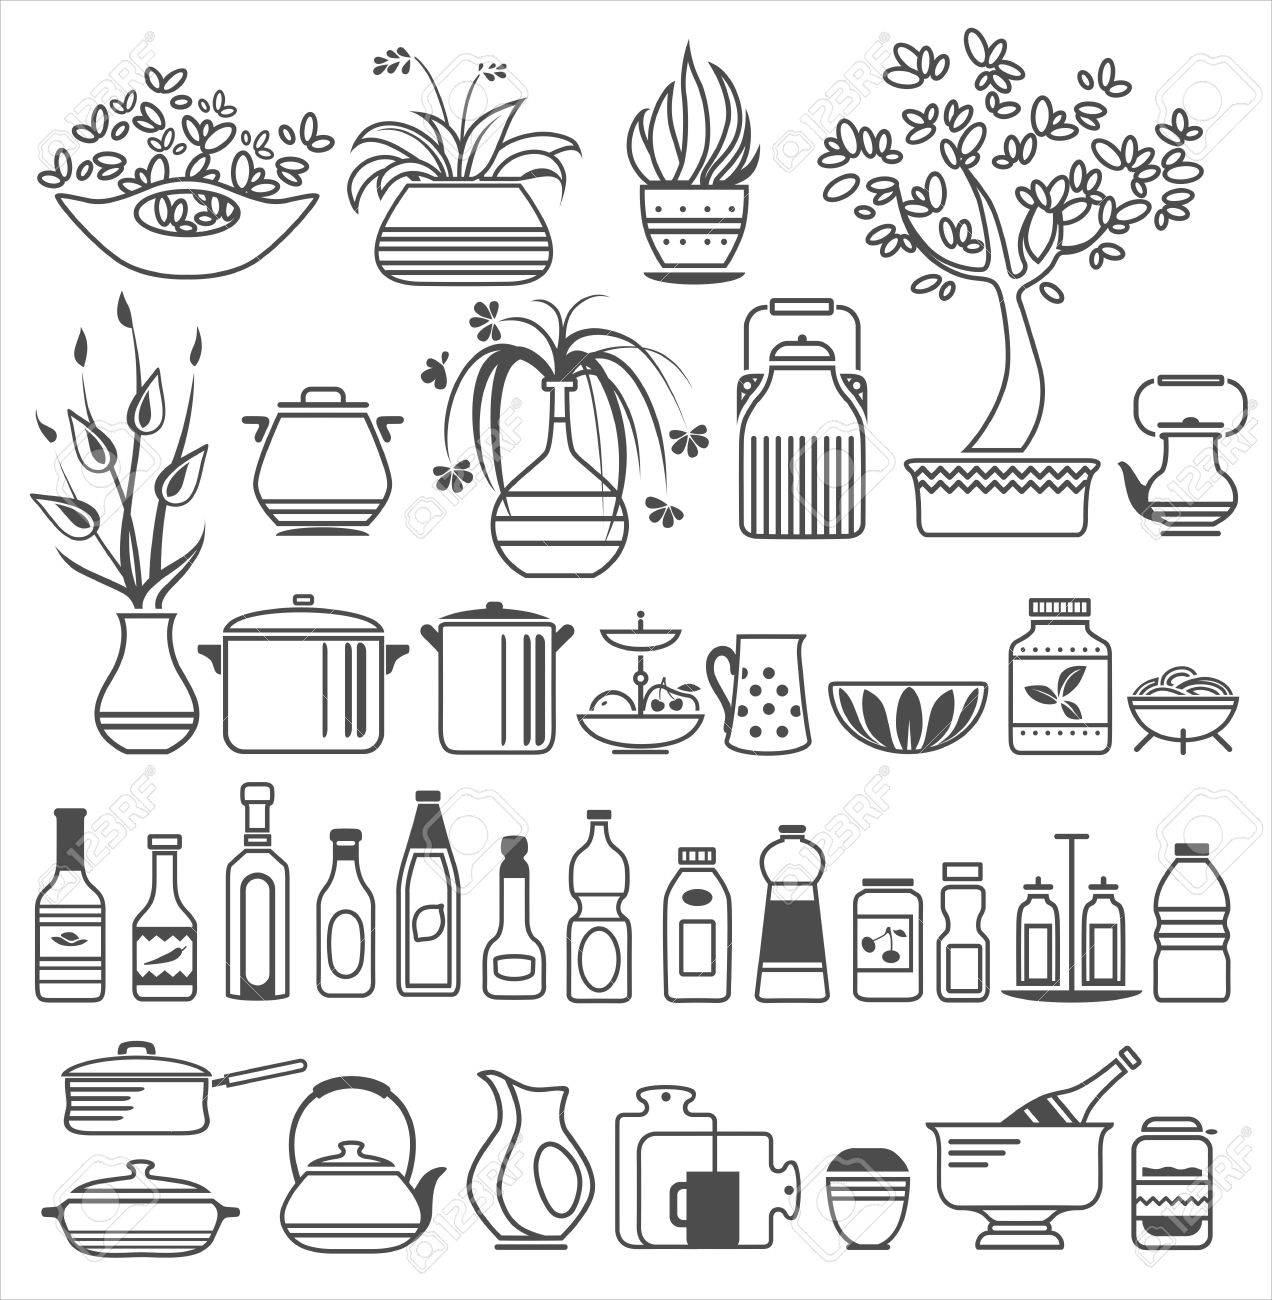 kitchen tools and utensils. Vector illustration Stock Vector - 20869243